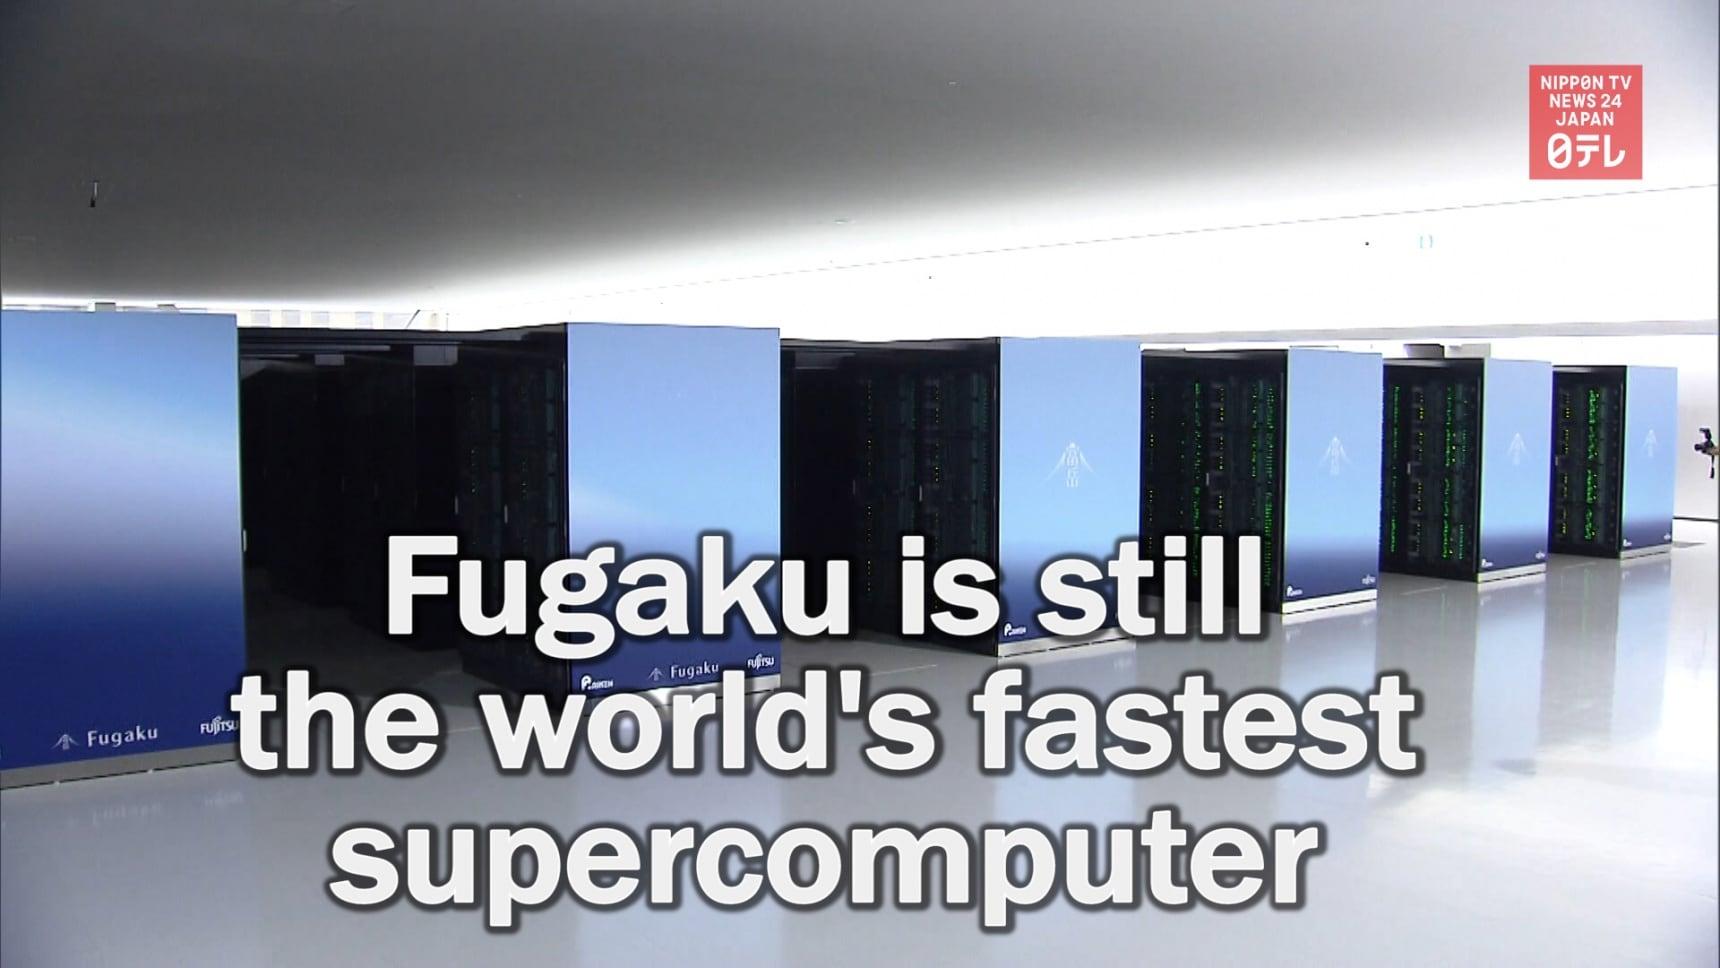 Fugaku Reigns as World's Fastest Supercomputer